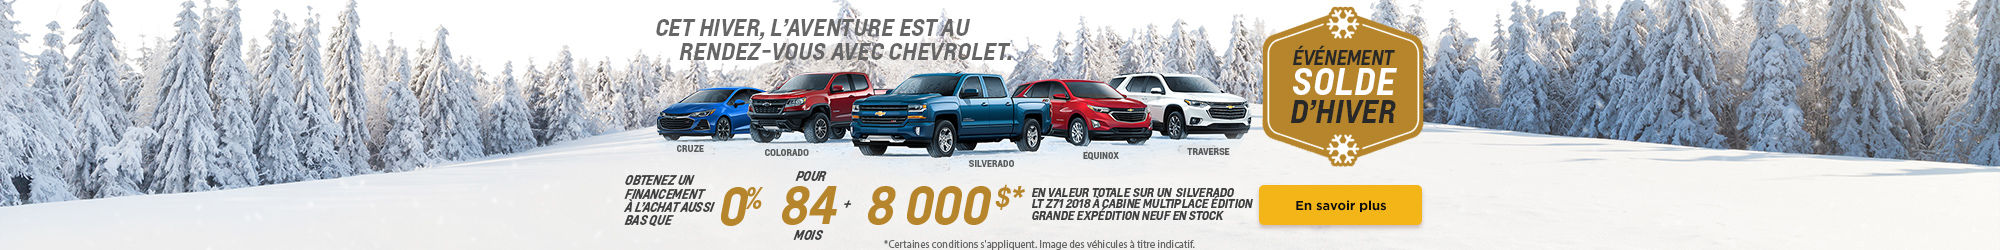 Grenier Chevrolet Buick Gmc Concessionnaire Gm Terrebonne